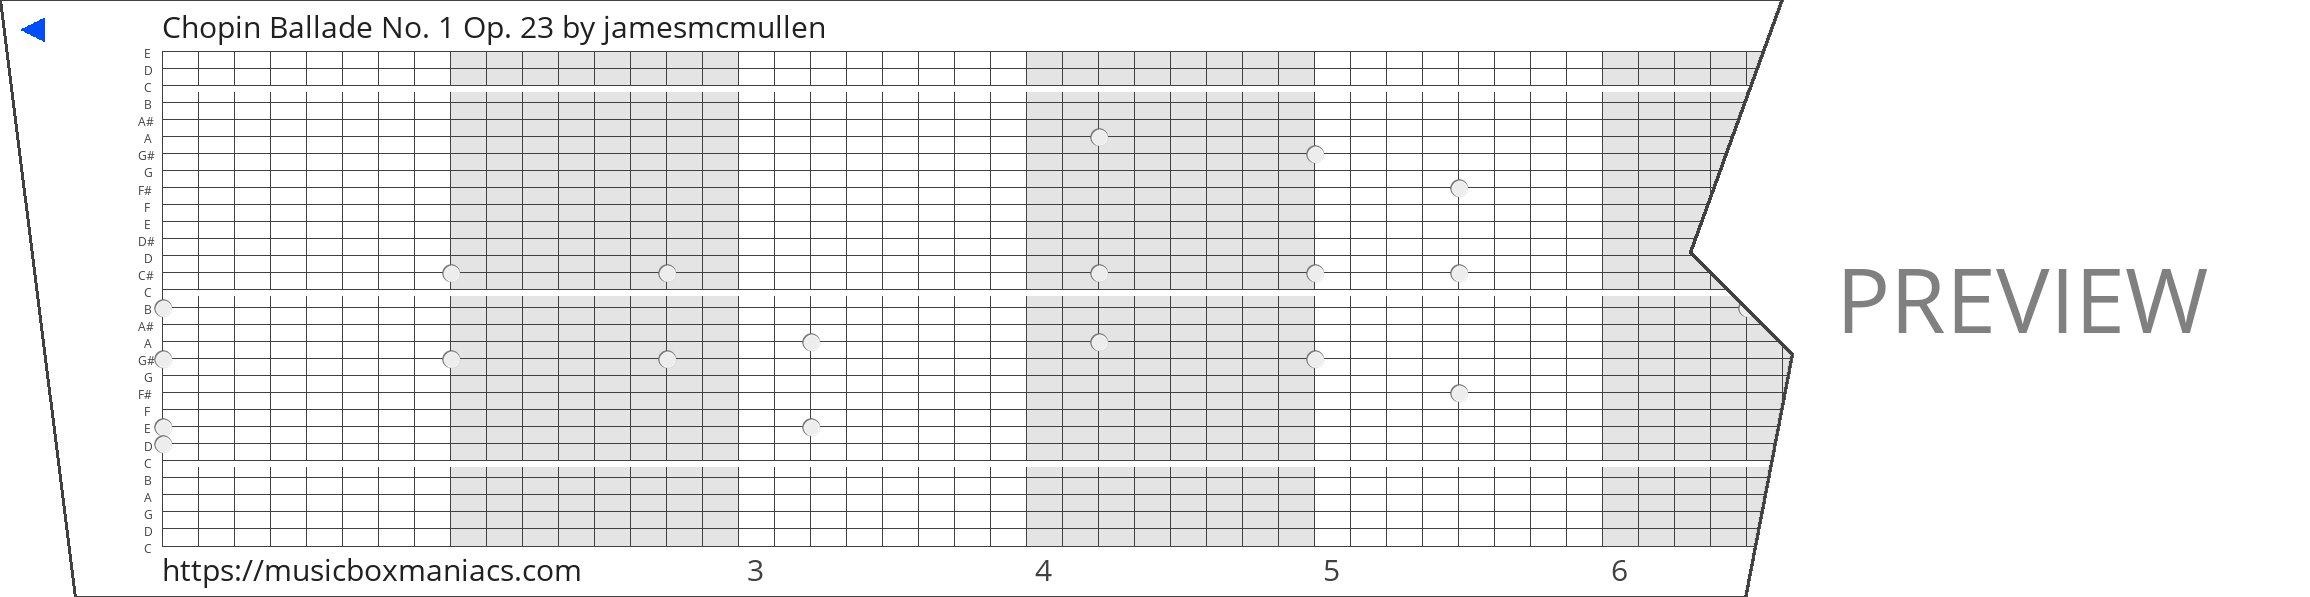 Chopin Ballade No. 1 Op. 23 30 note music box paper strip